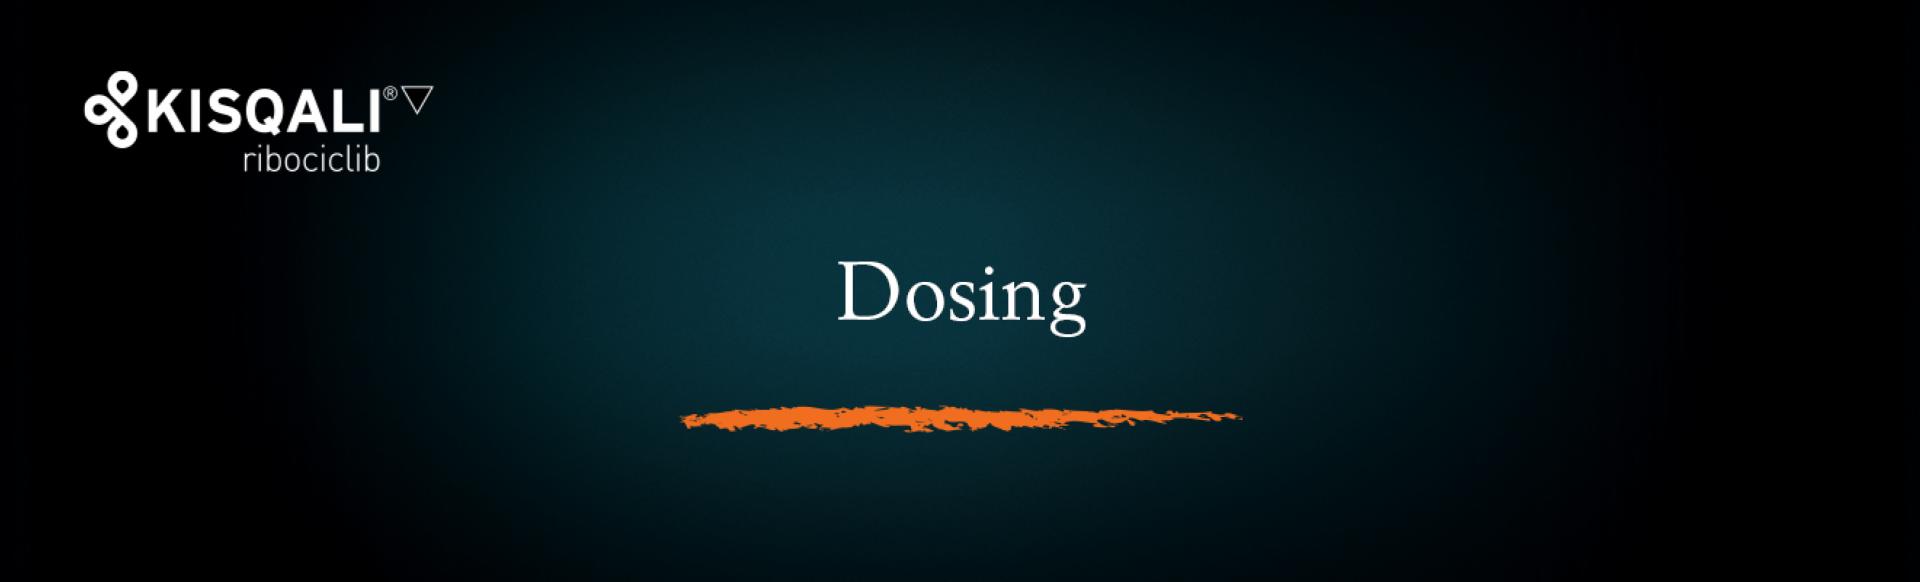 Top banner. Dosing